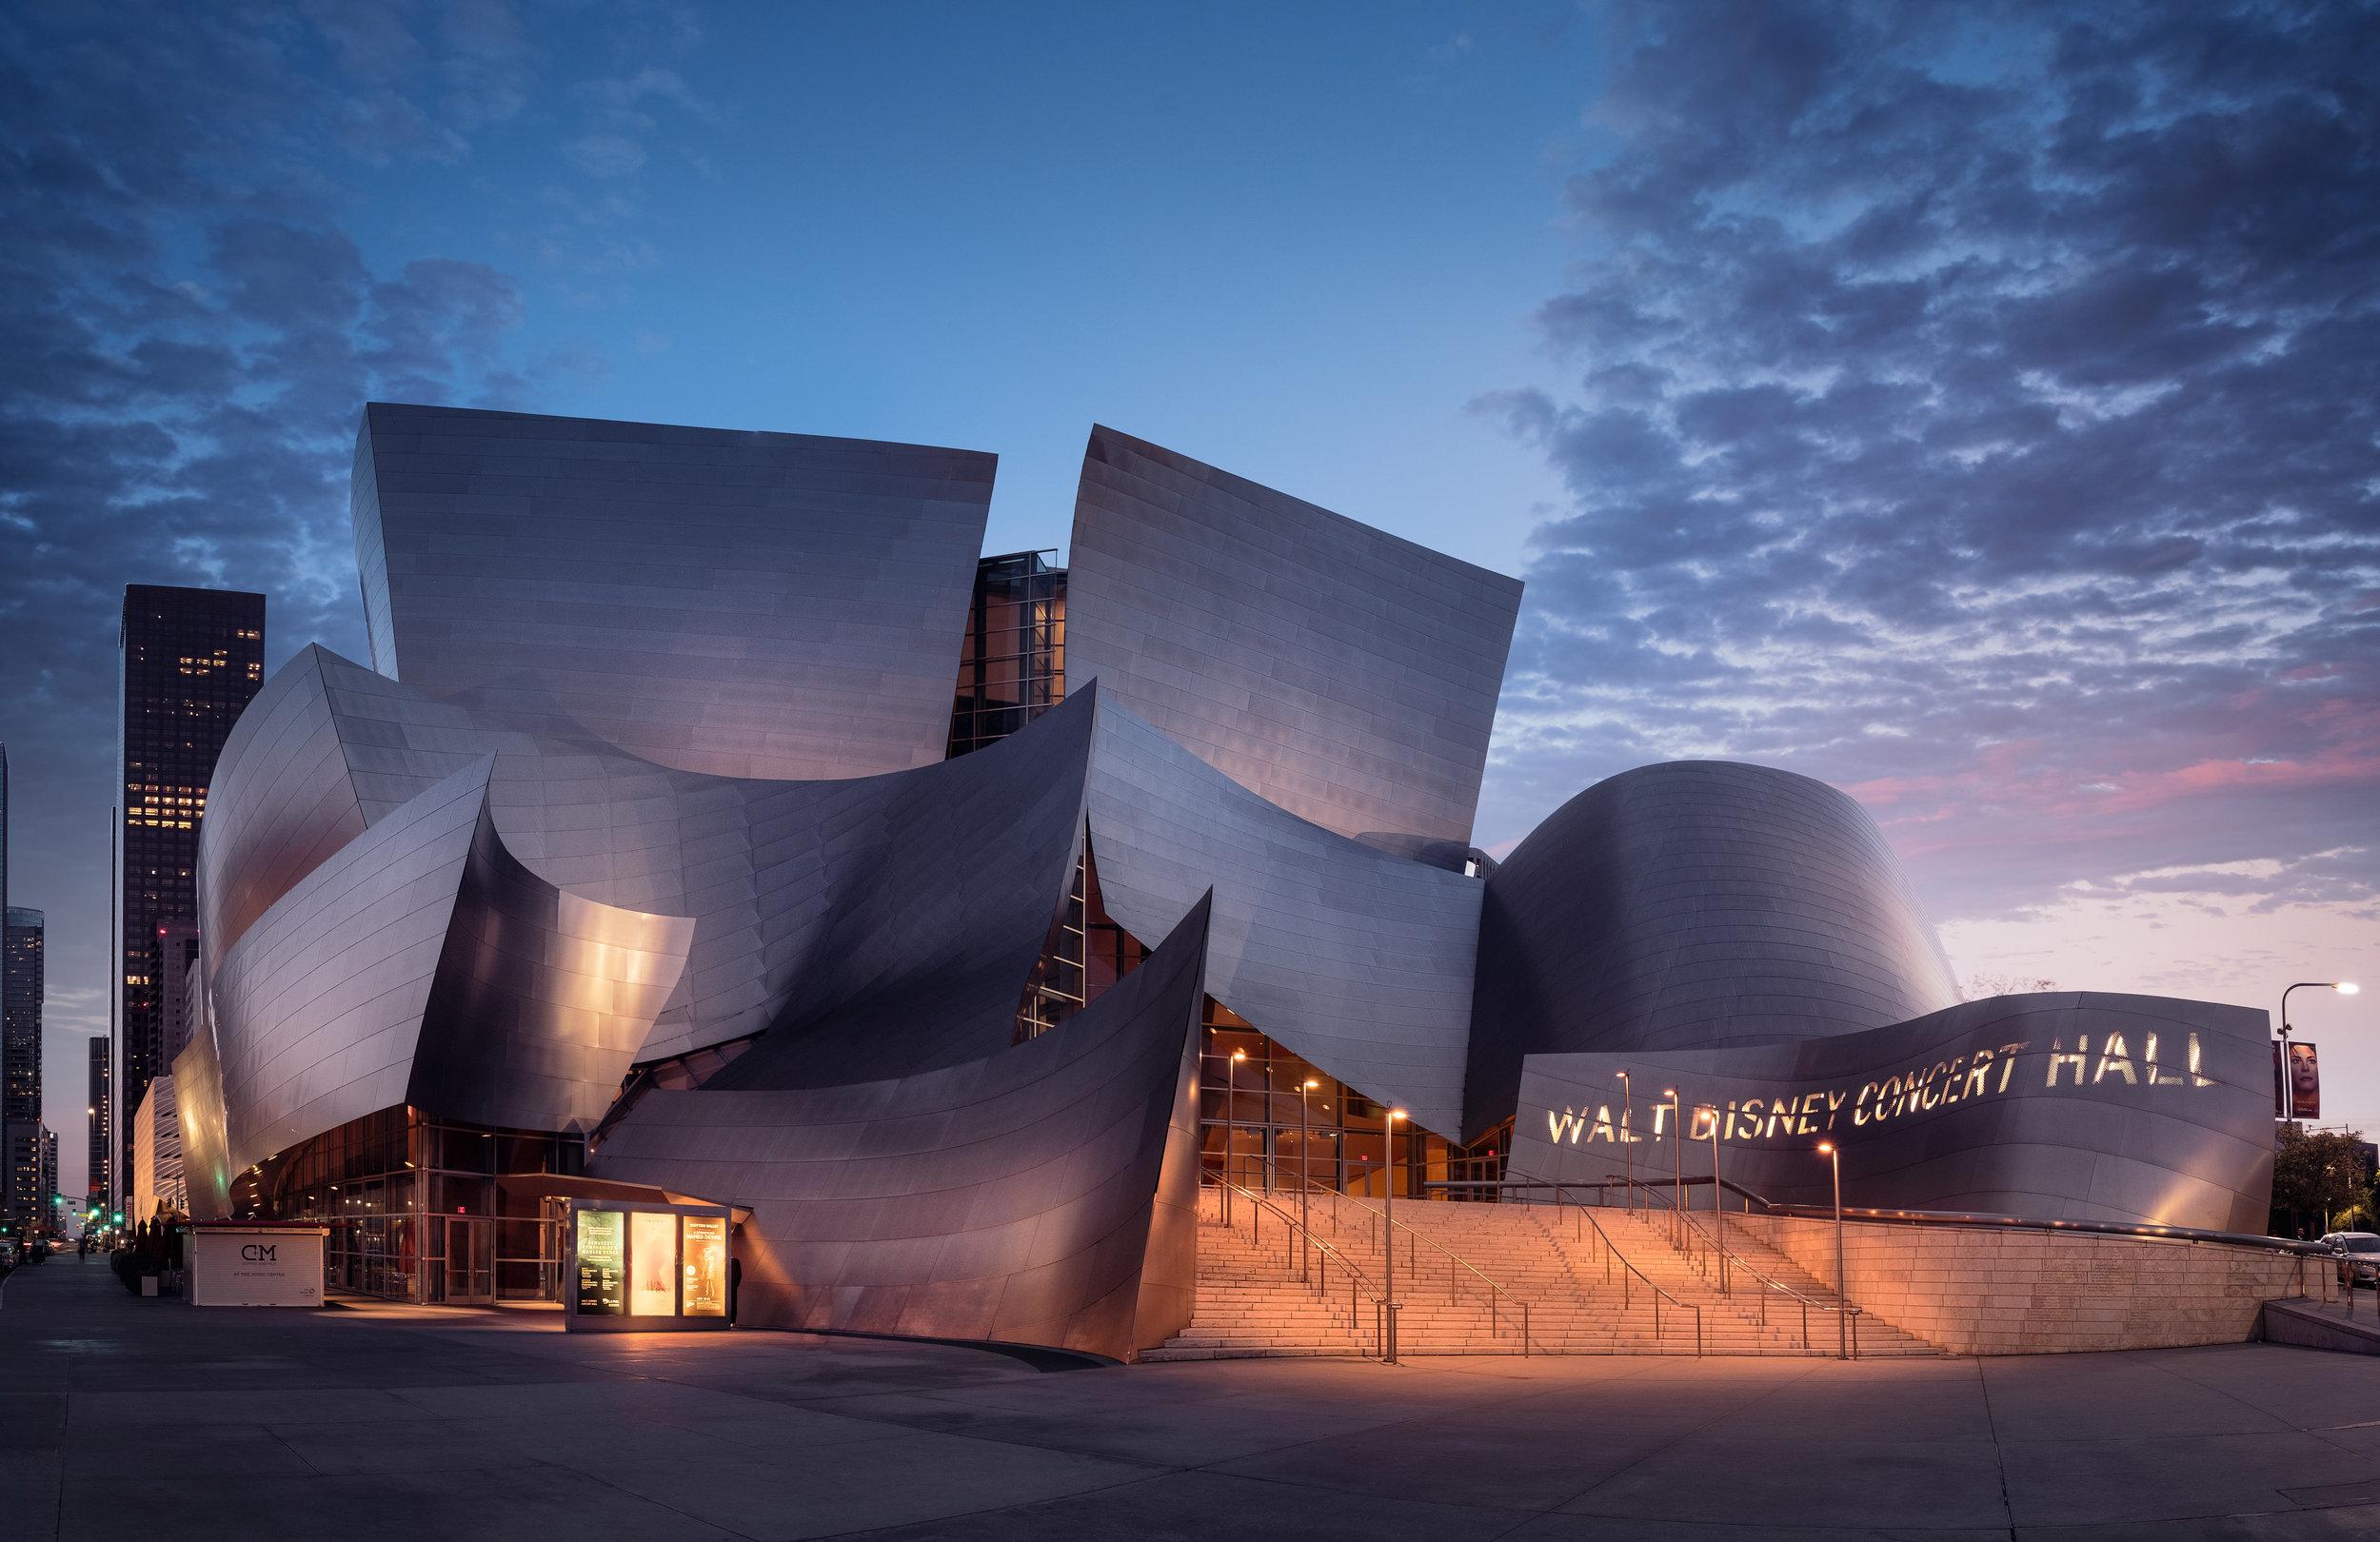 Walt Disney Concert Hall: Los Angeles, California